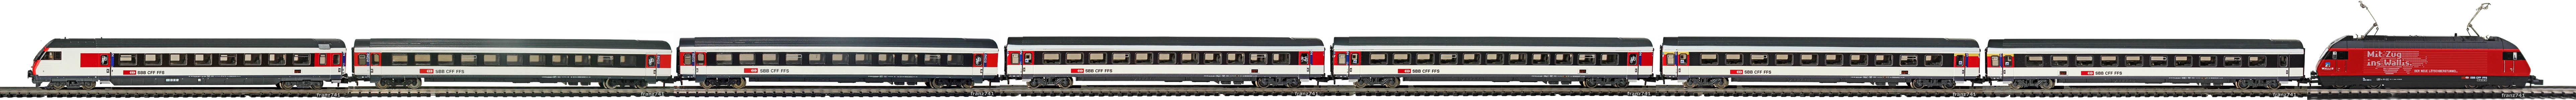 Epoche-V-SBB-EW-IV-Personenzug-Re-460-EW-IV-Wagen-IC-New-Look-FLM